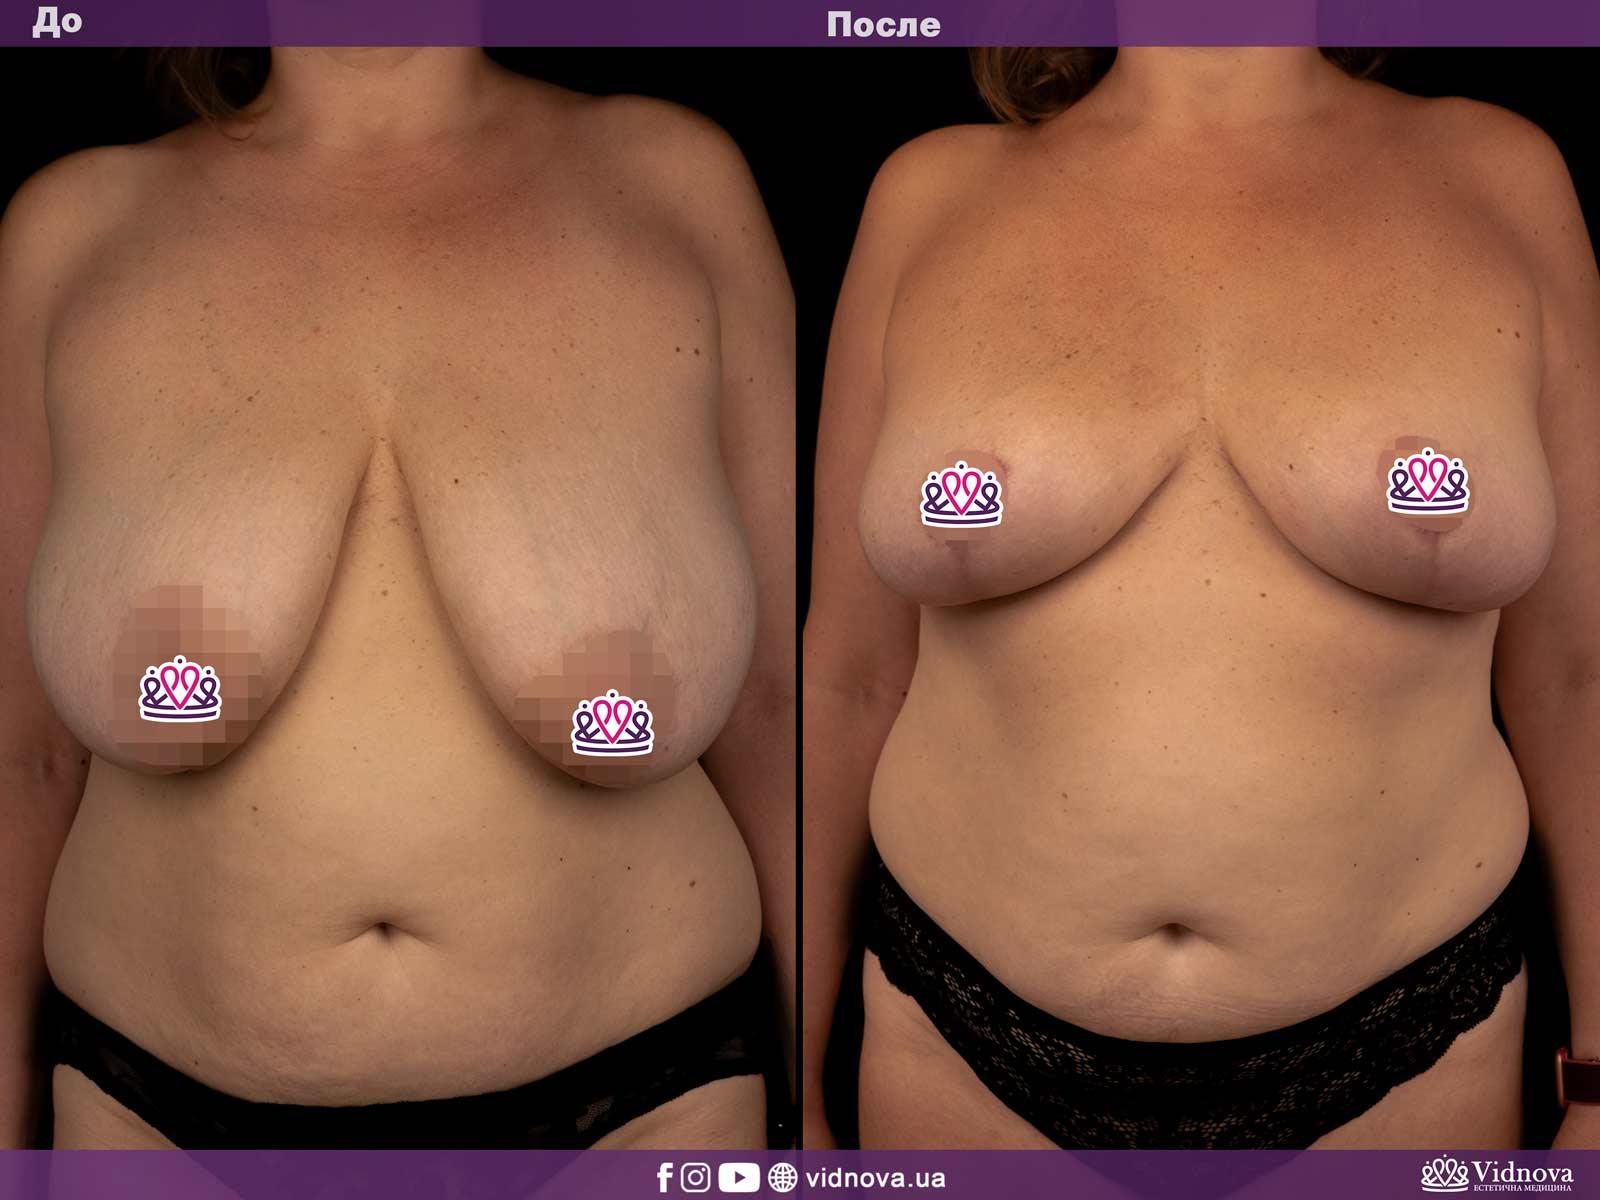 Уменьшение груди: Фото ДО и ПОСЛЕ - Пример №1-1 - Клиника Vidnova